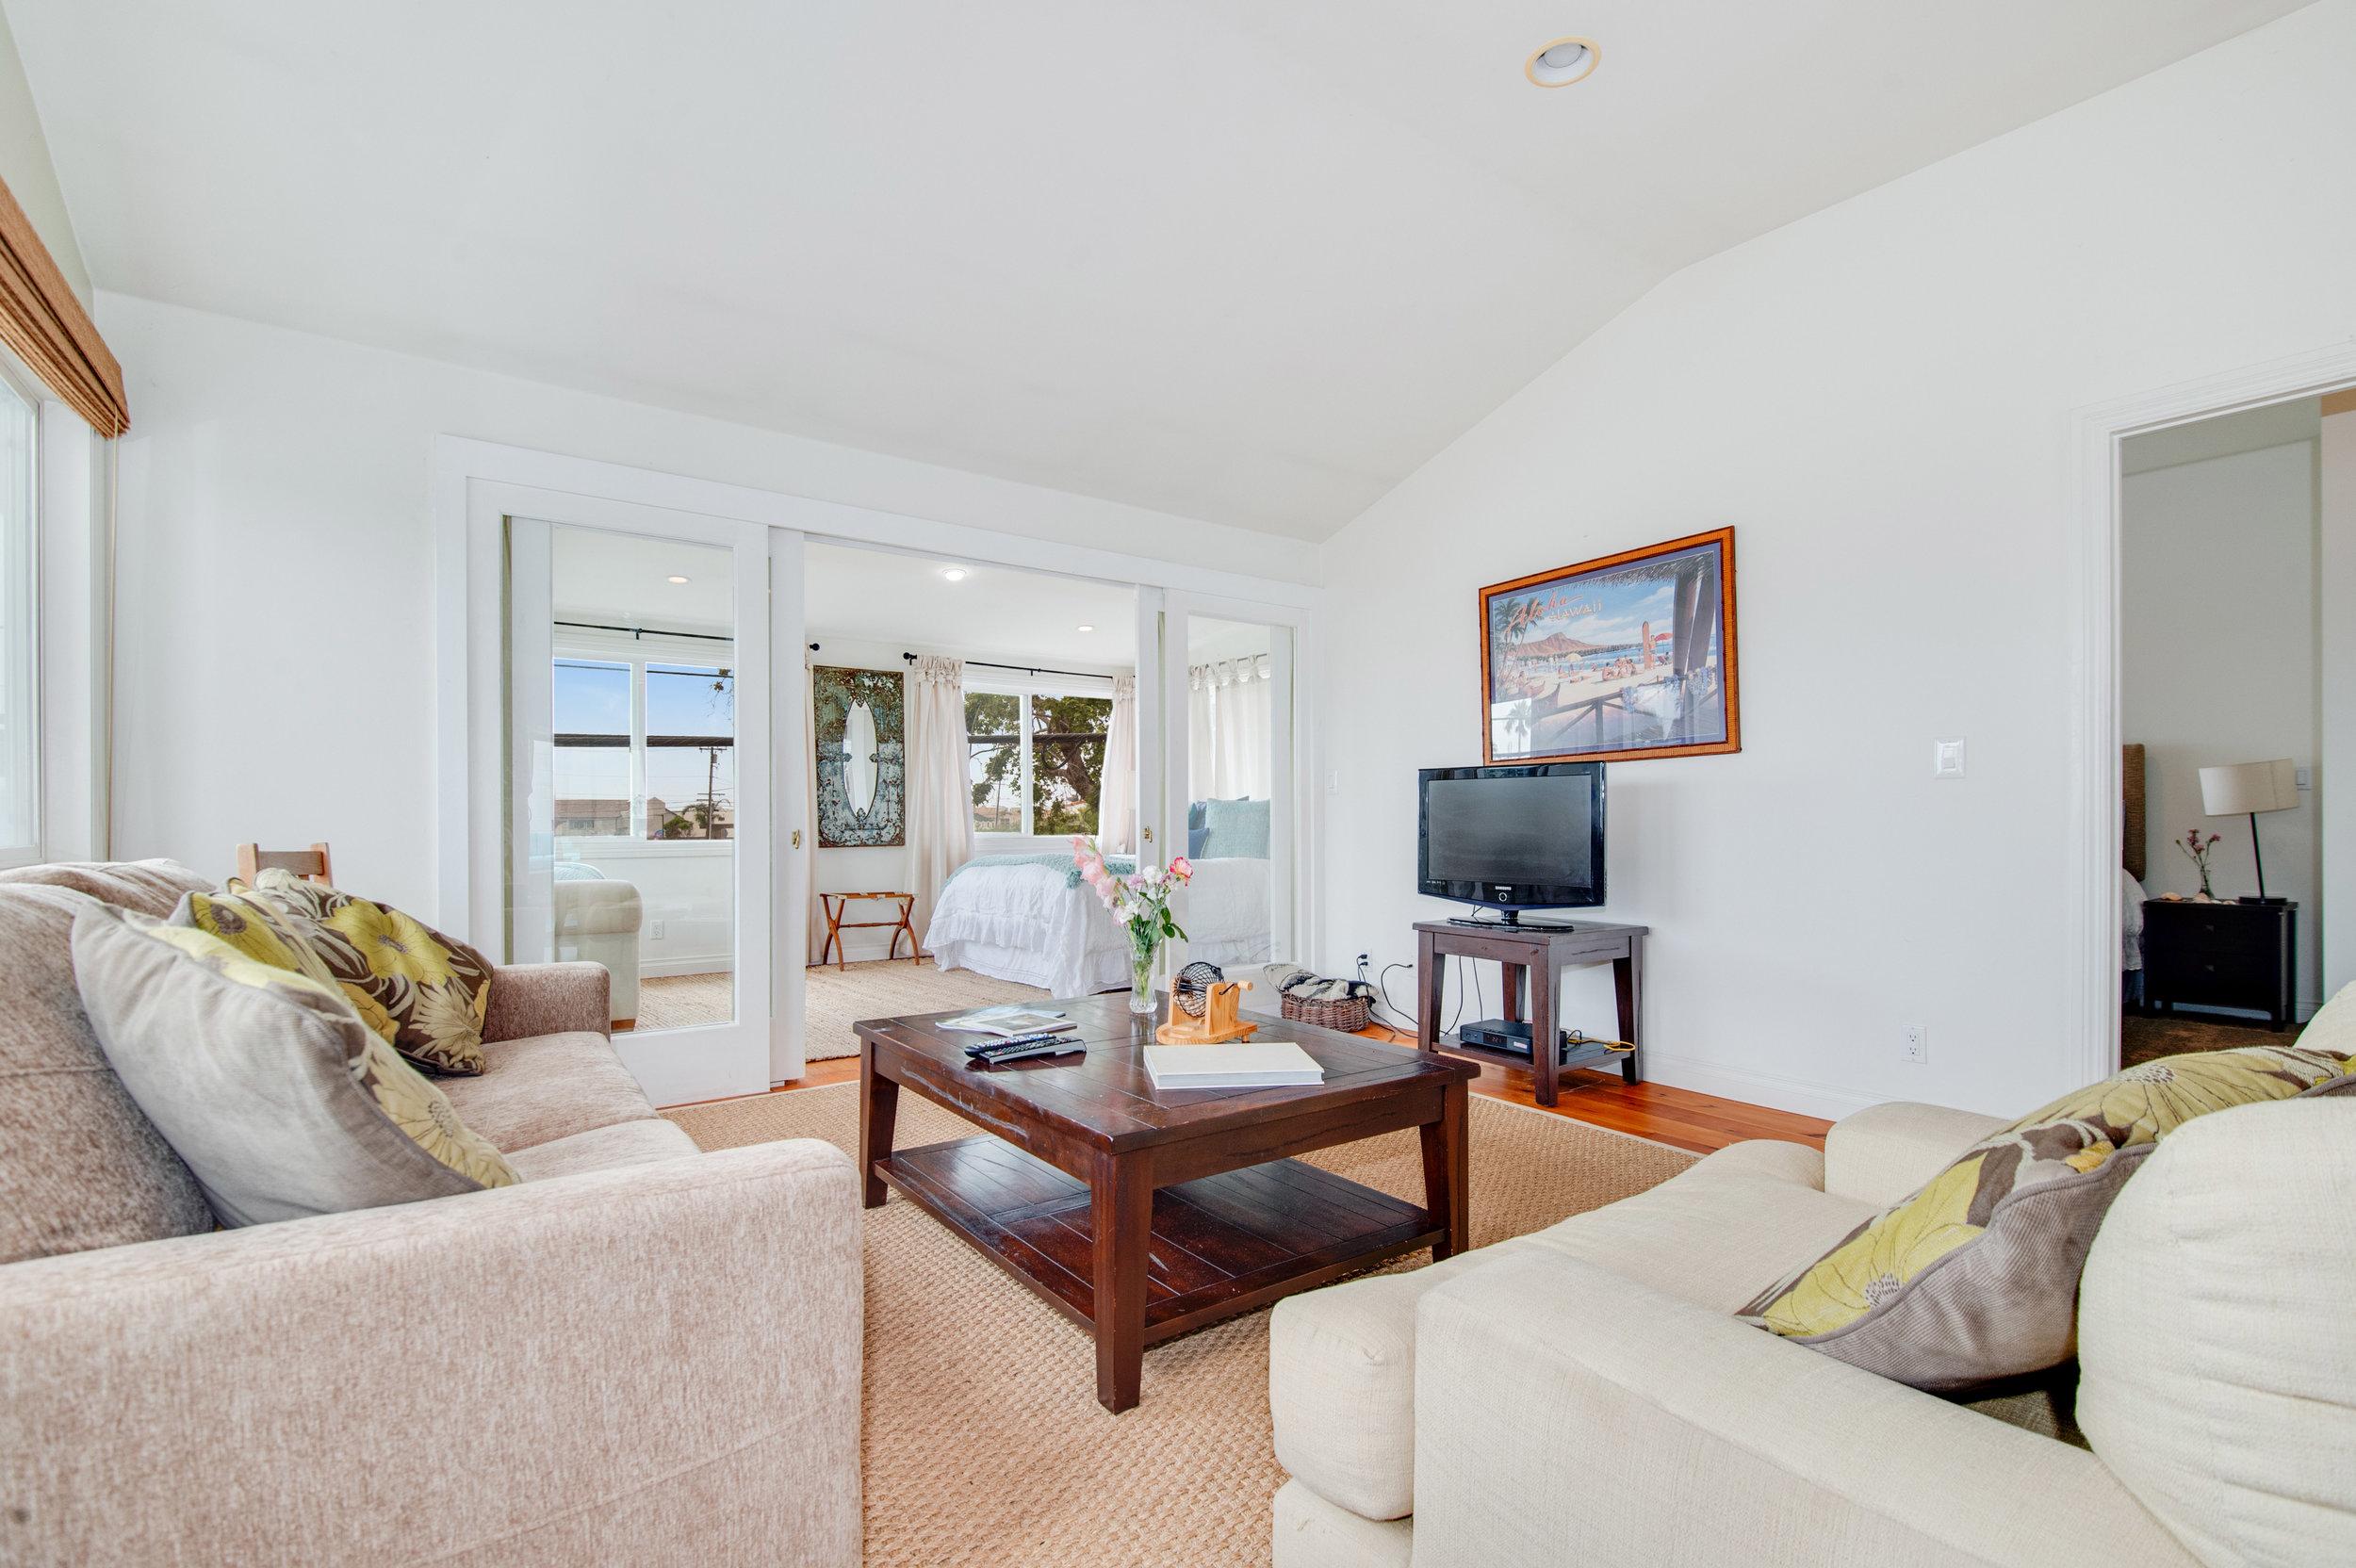 005 Living Room 3952 Las Flores For Sale Lease The Malibu Life Team Luxury Real Estate.jpg